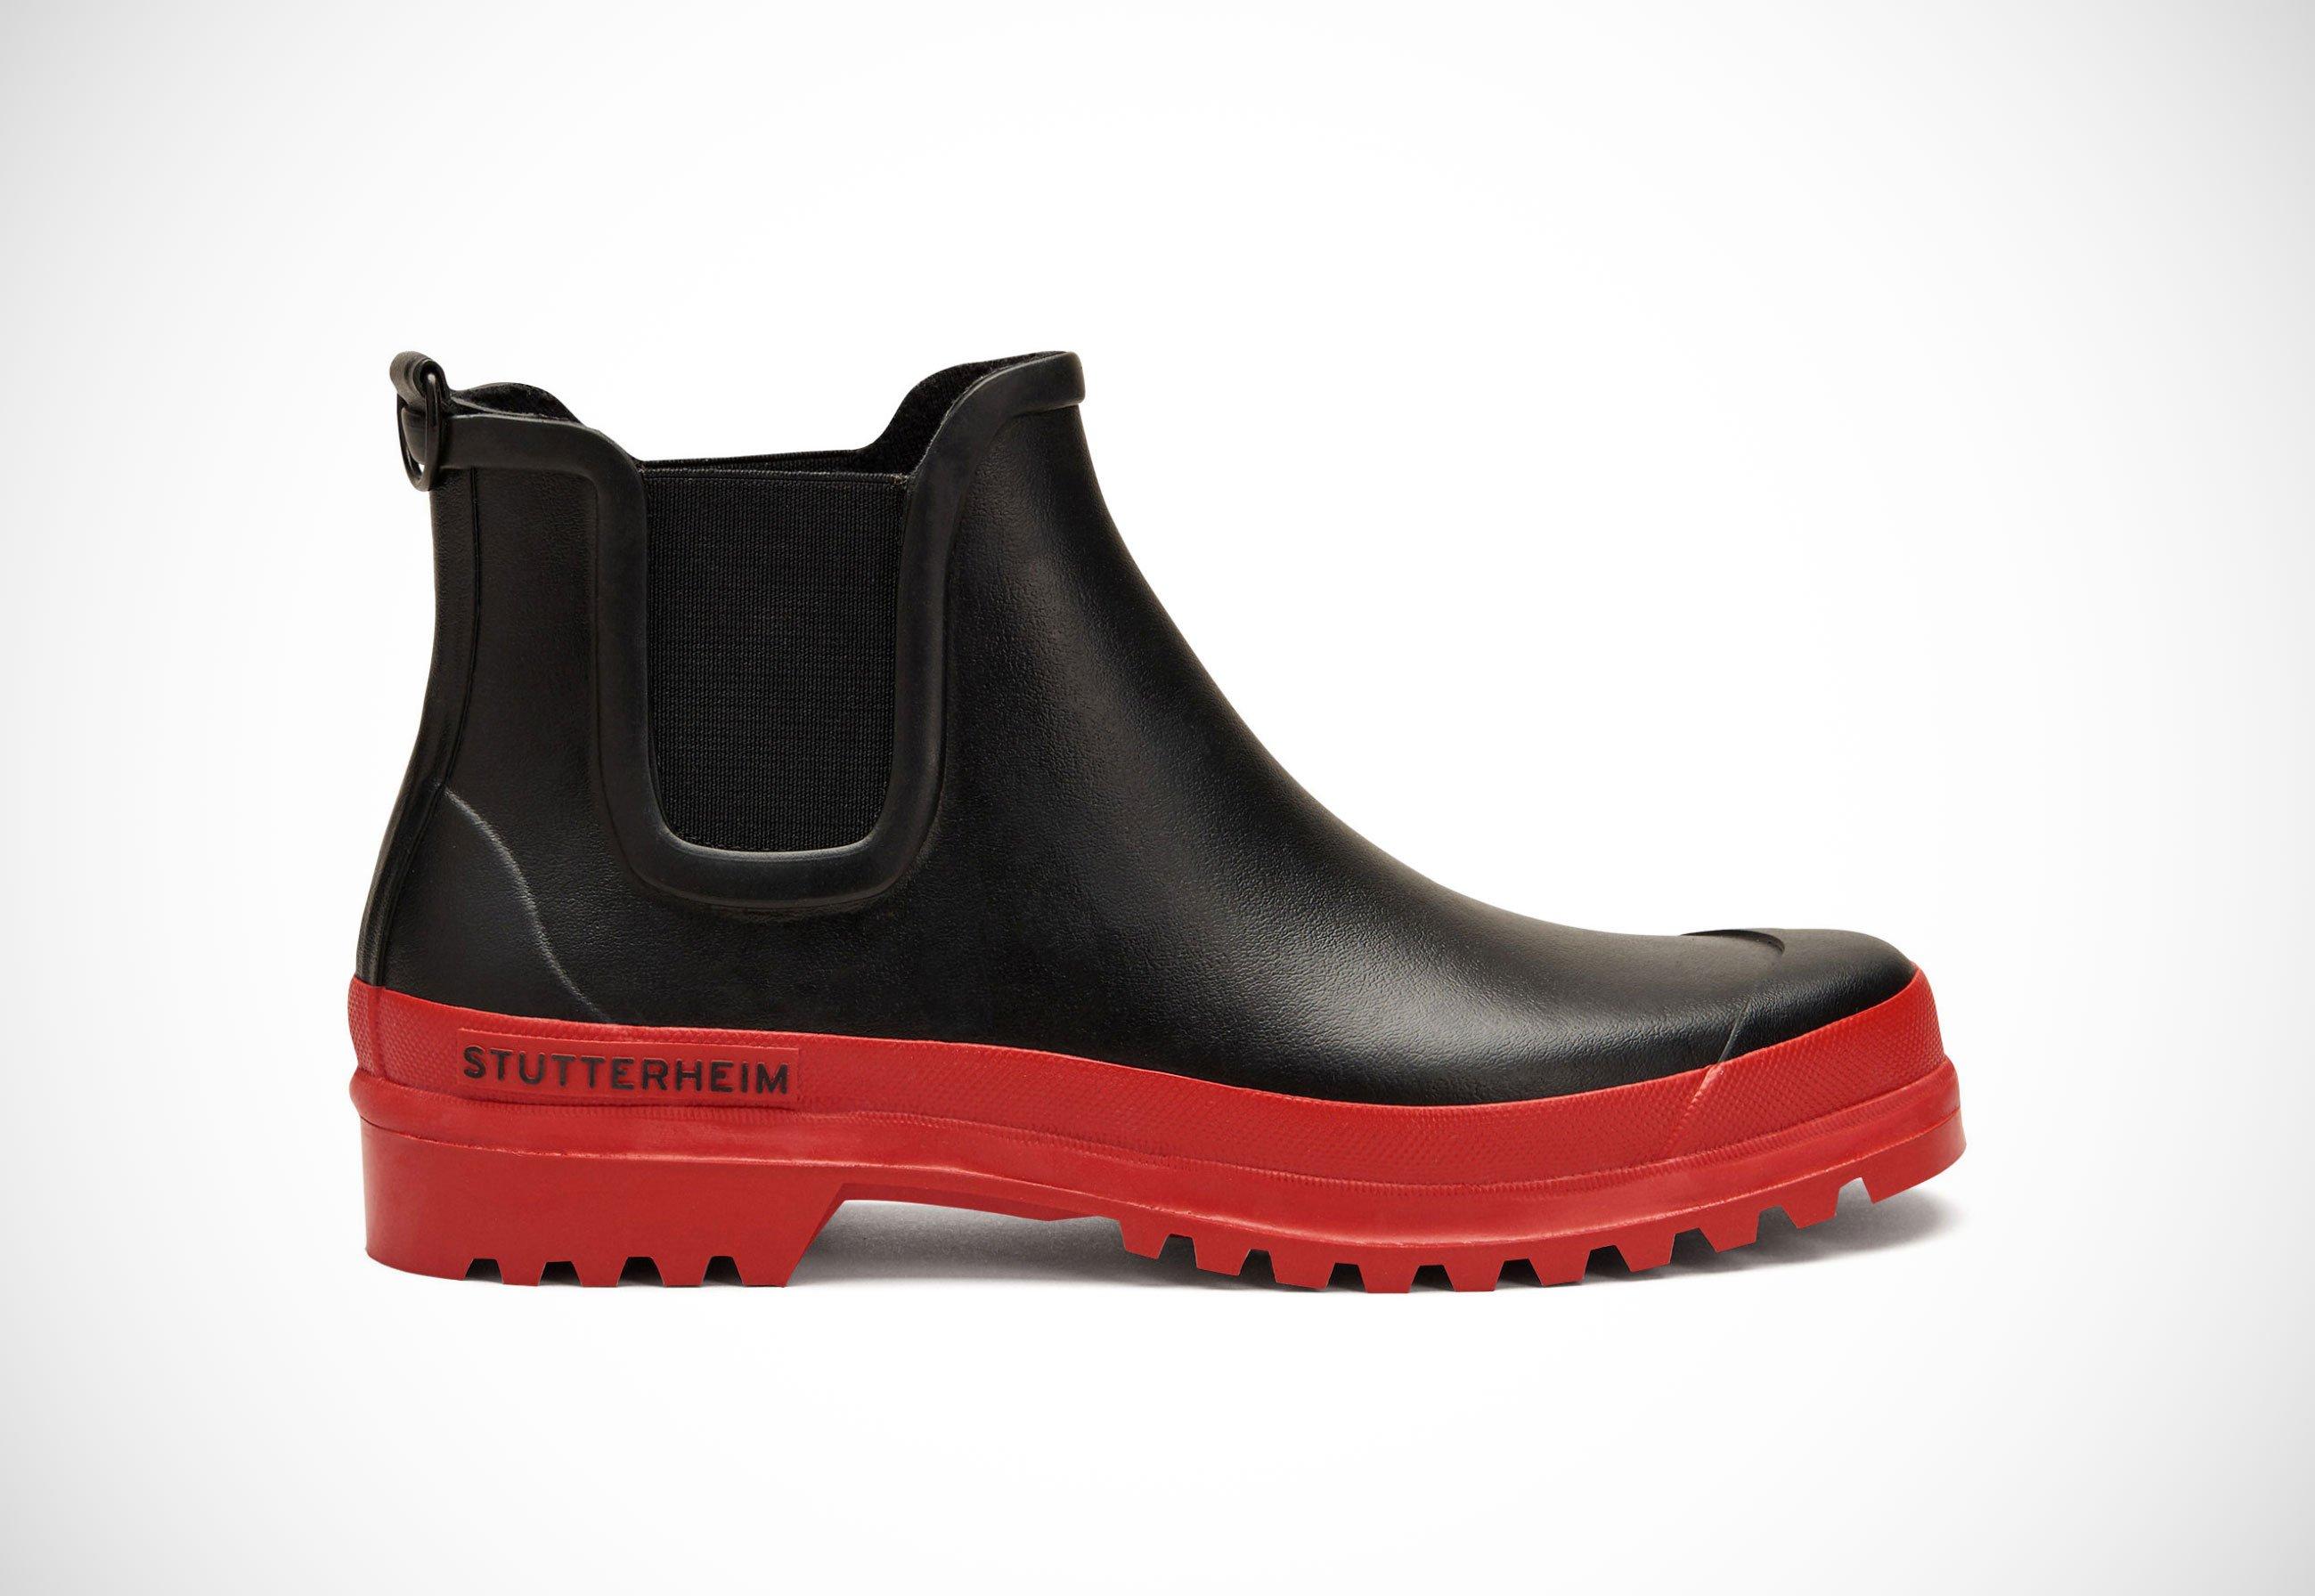 Stutterheim chelsea rainwalker boot the limited edition chelsea rainwalker boot will be available in stutterheims online shop the brands stockholm and new york flagship stores will also solutioingenieria Choice Image